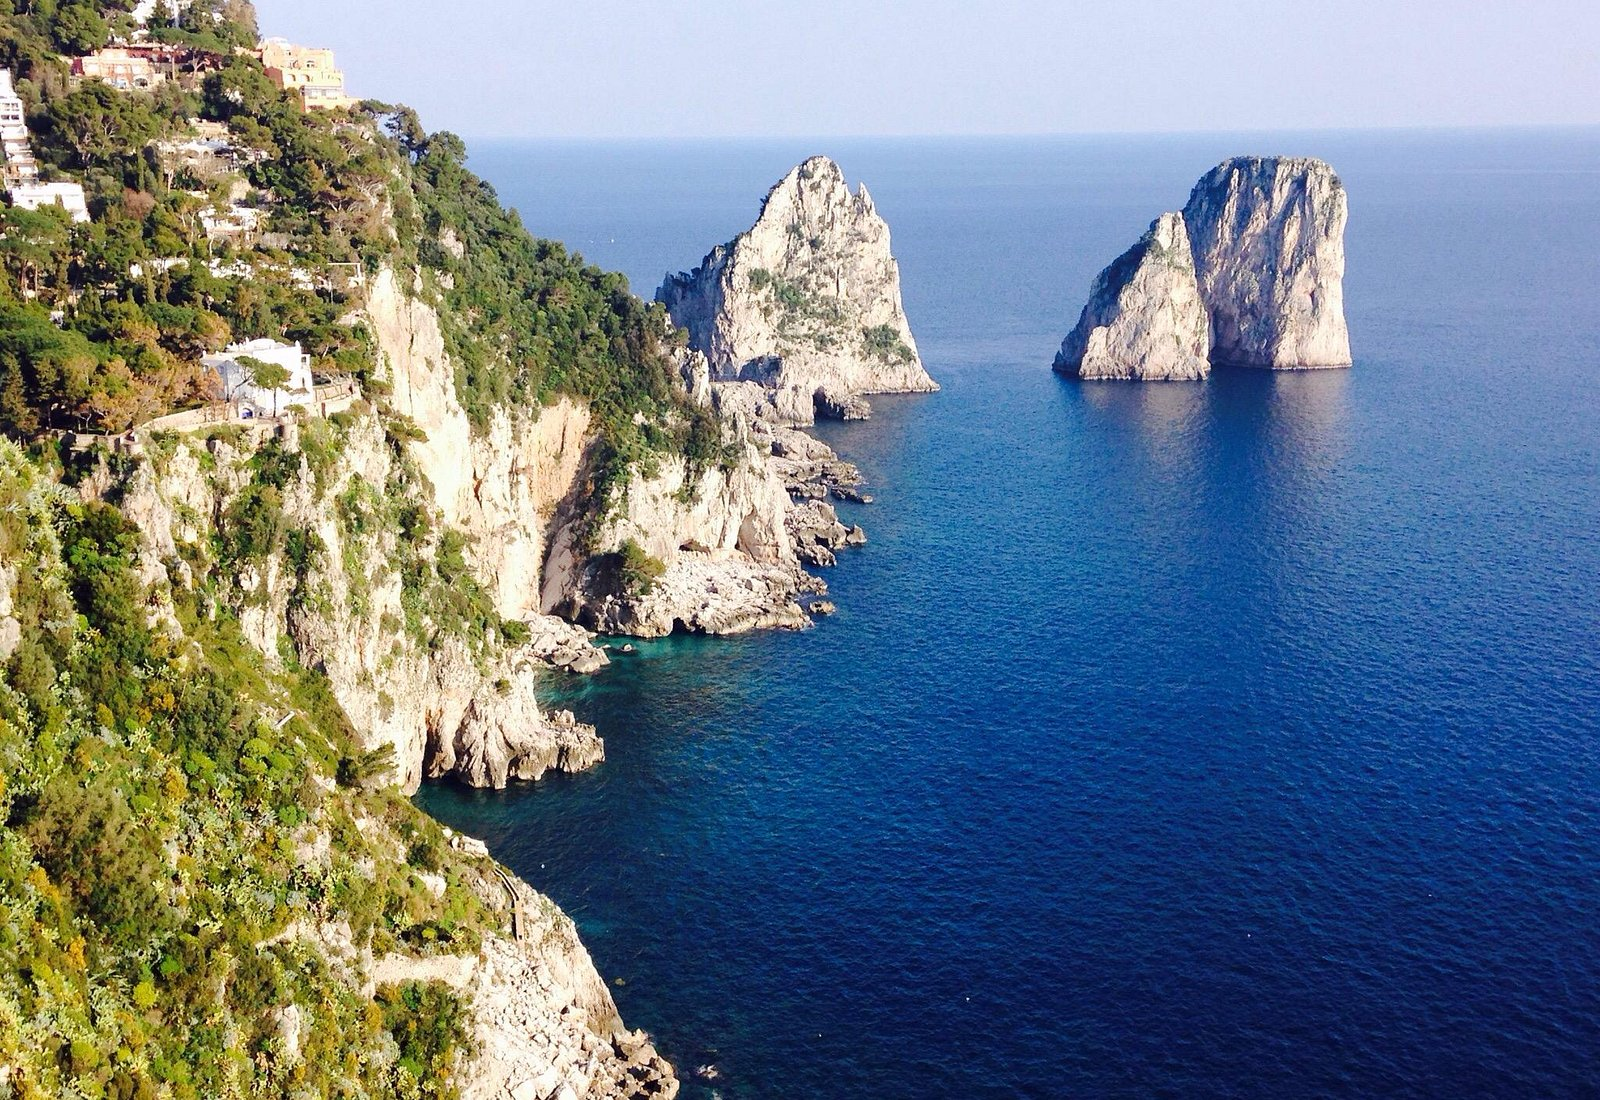 Capri Island ( faraglioni rocks)